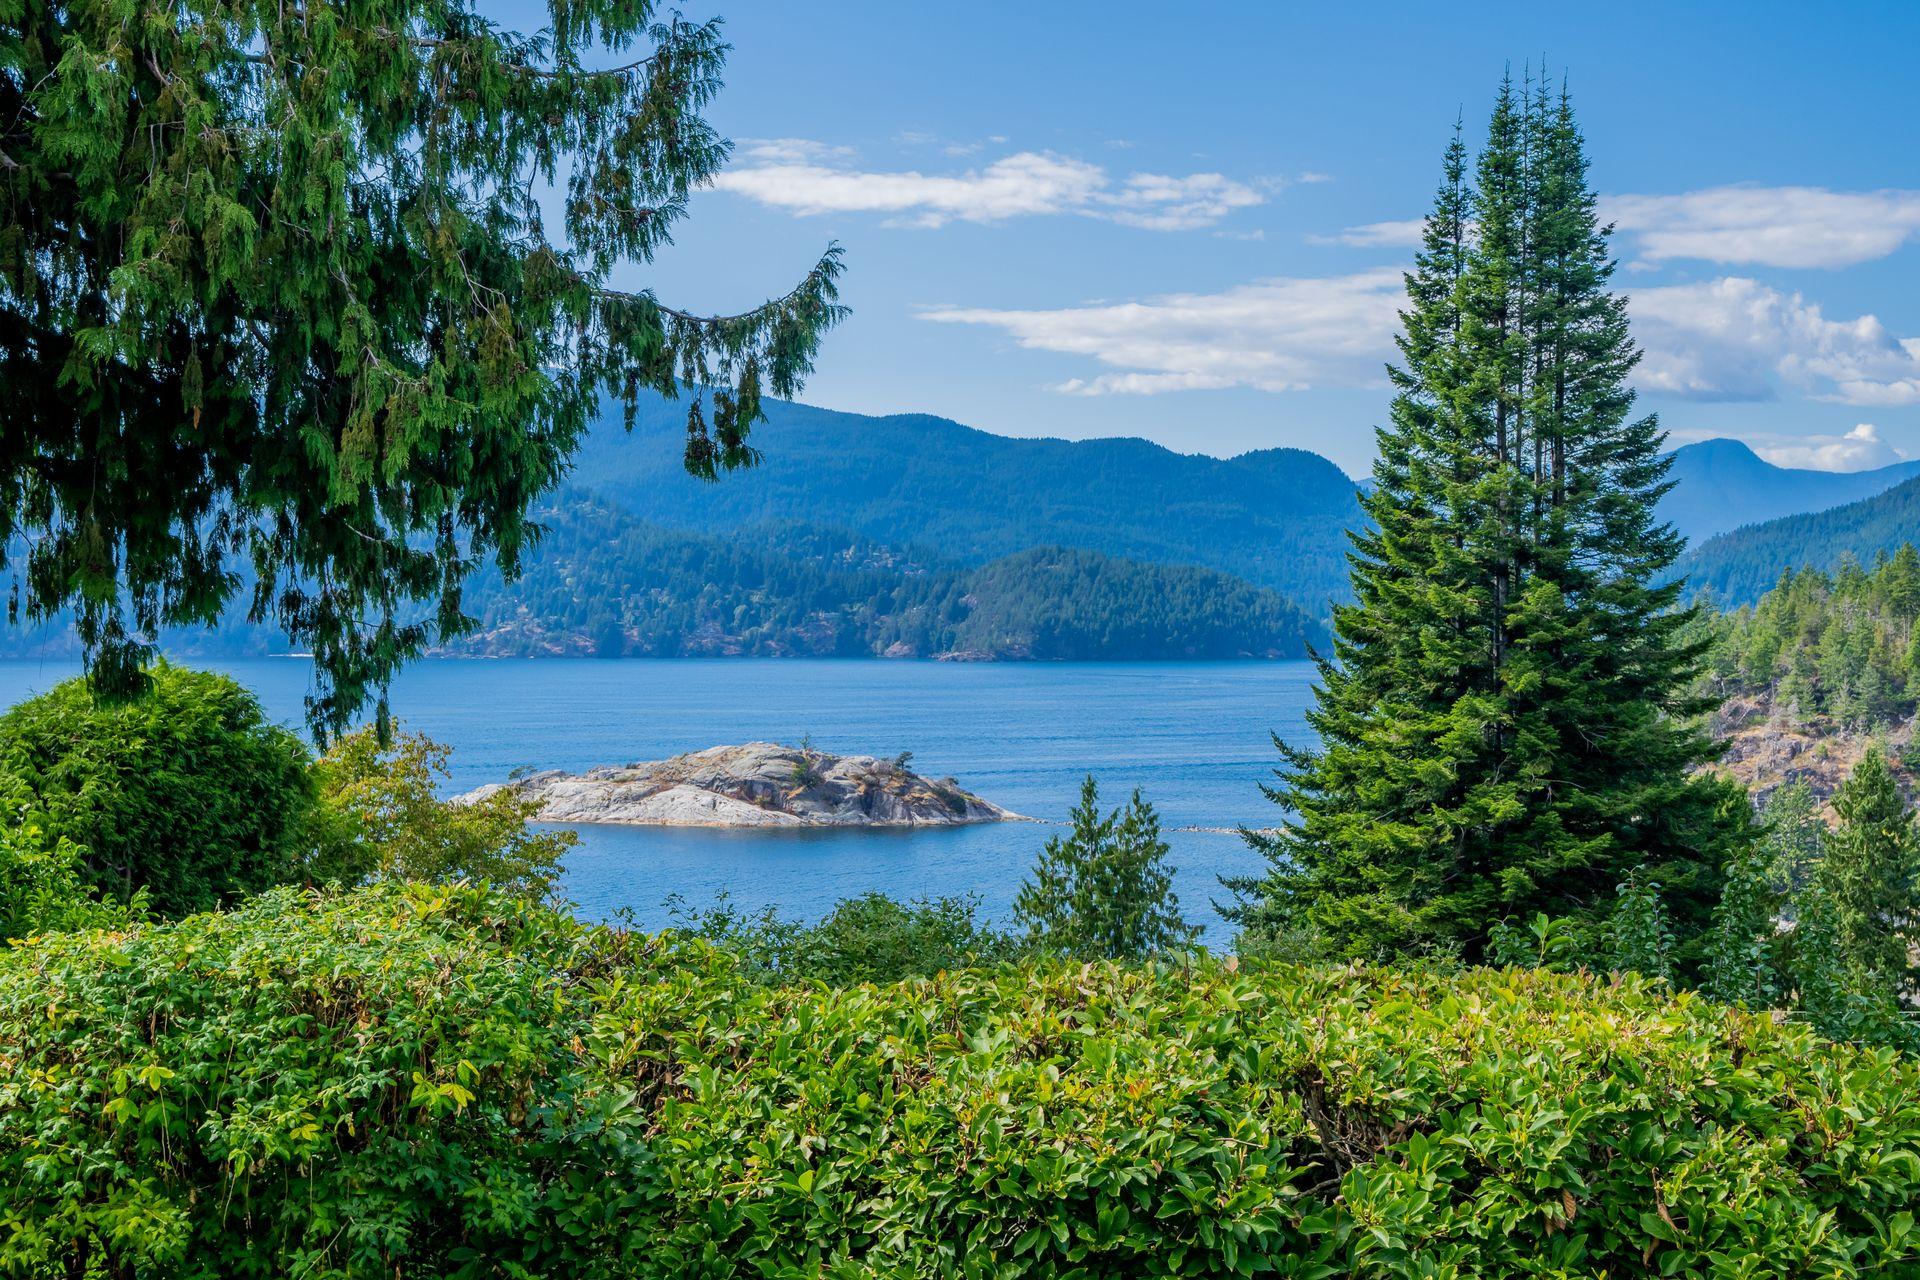 6245-nelson-avenue-west-vancouver-42 at 6245 Nelson Avenue, Gleneagles, West Vancouver